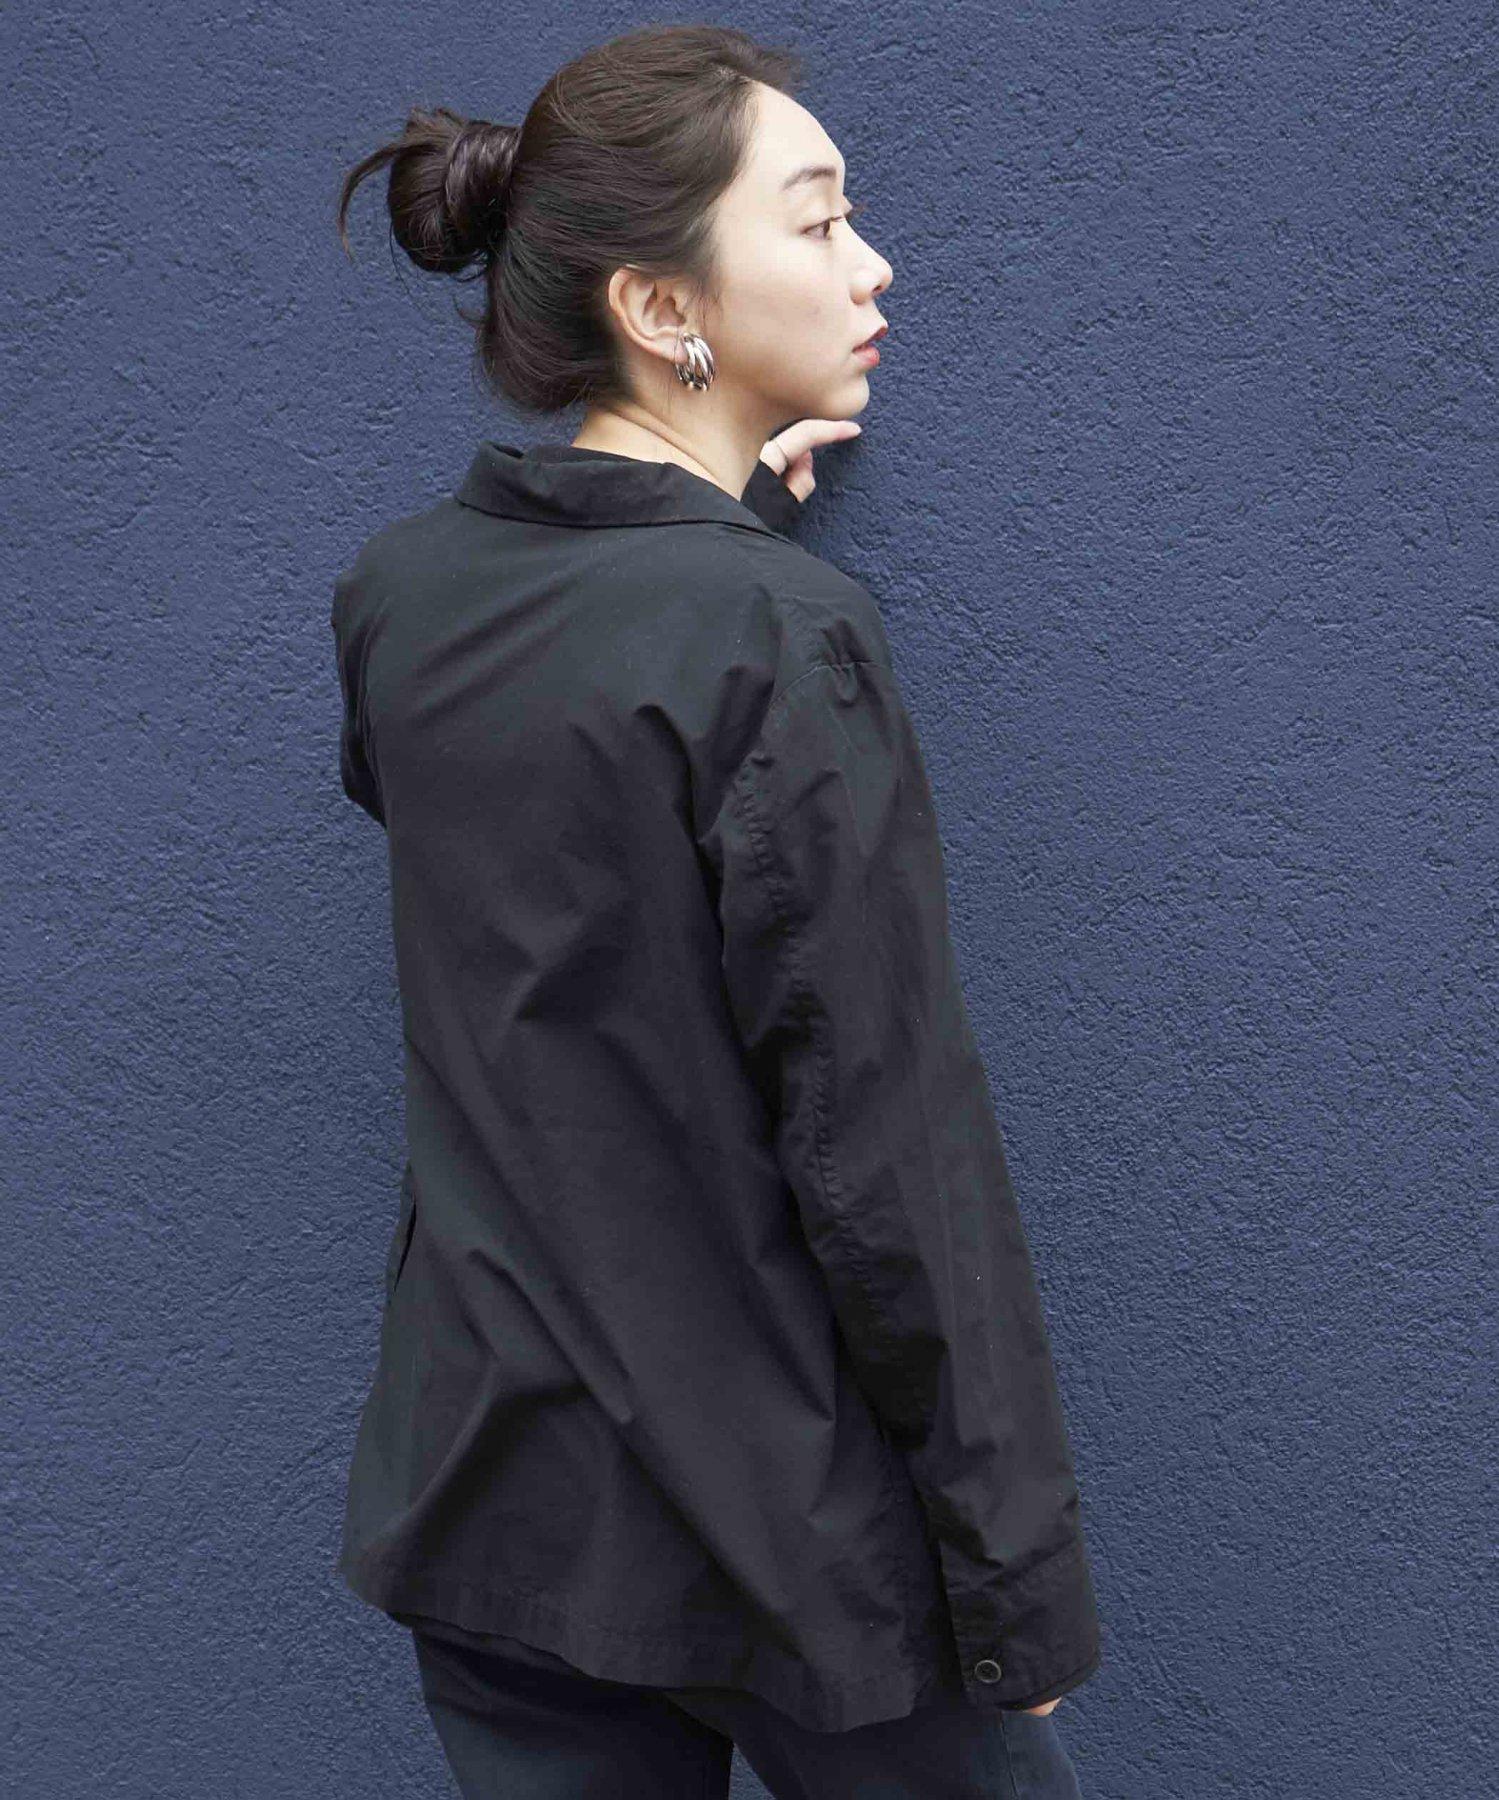 【REBIRTH PROJECT】オーガニックタイプライター ジャケット BLK(2月下旬お届け)